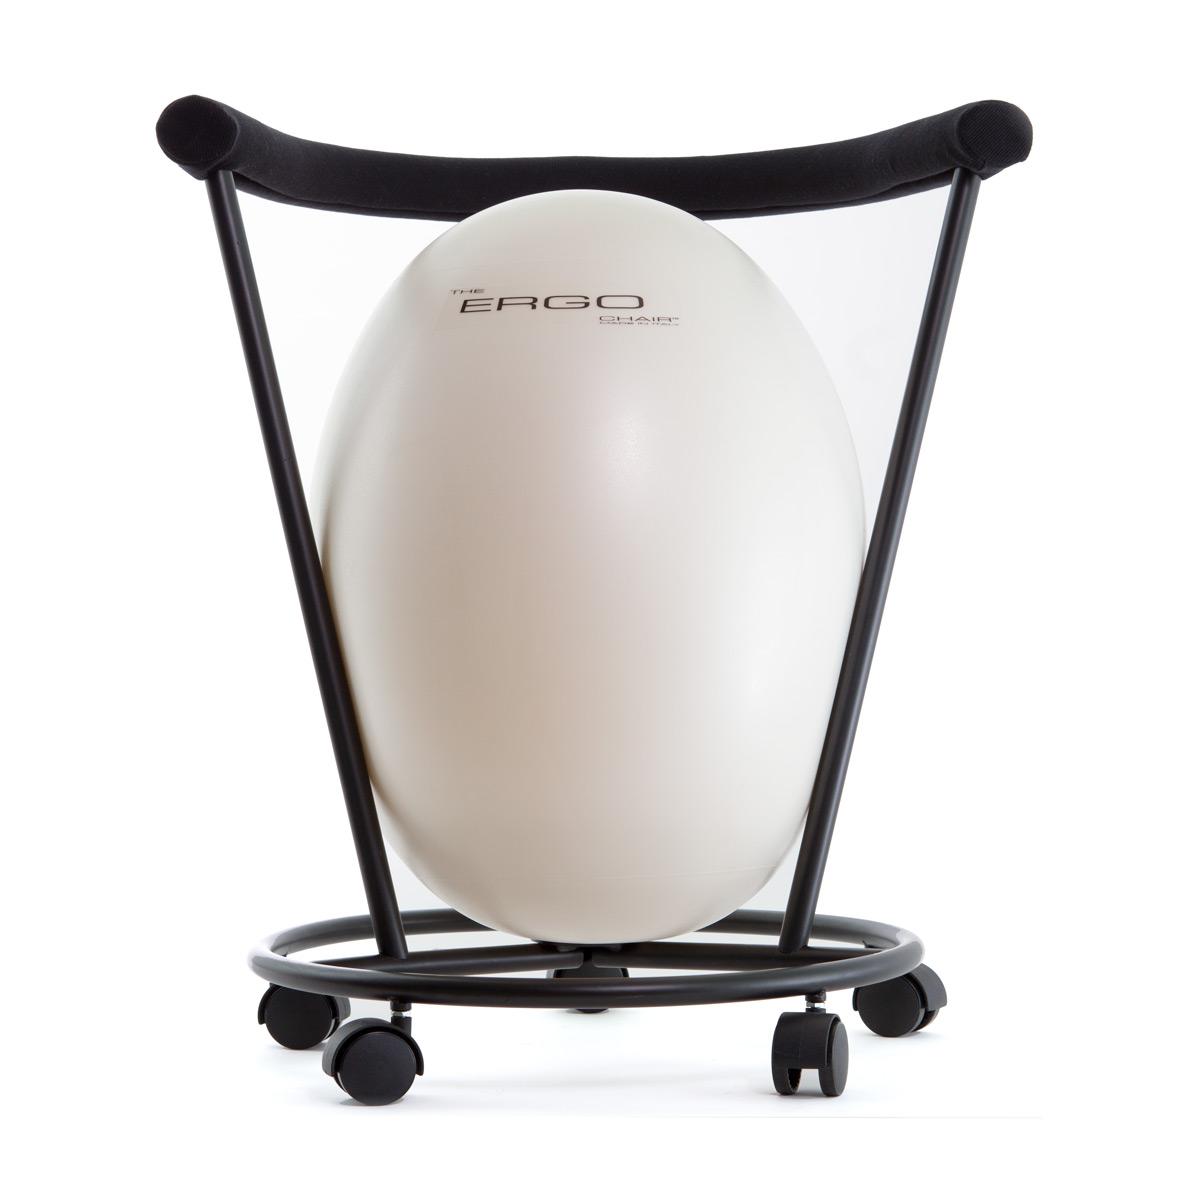 Ergonomic ball chair the ergo chair